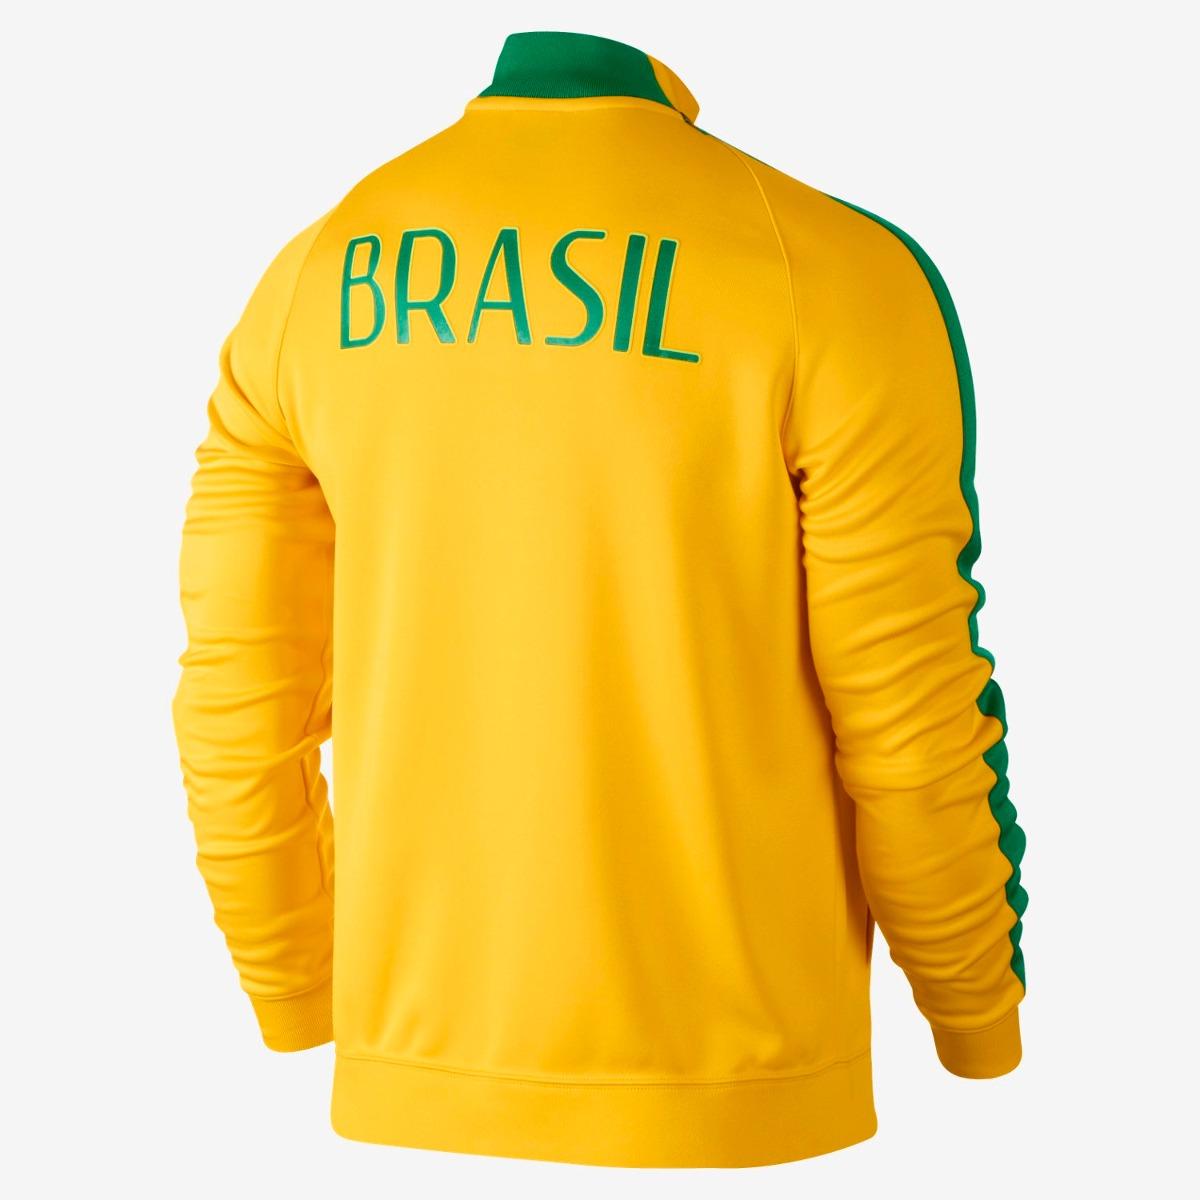 e20c143932 jaqueta nike n98 brasi cbf 2016 2018. carregando c5f8cea2cf3b7f ...